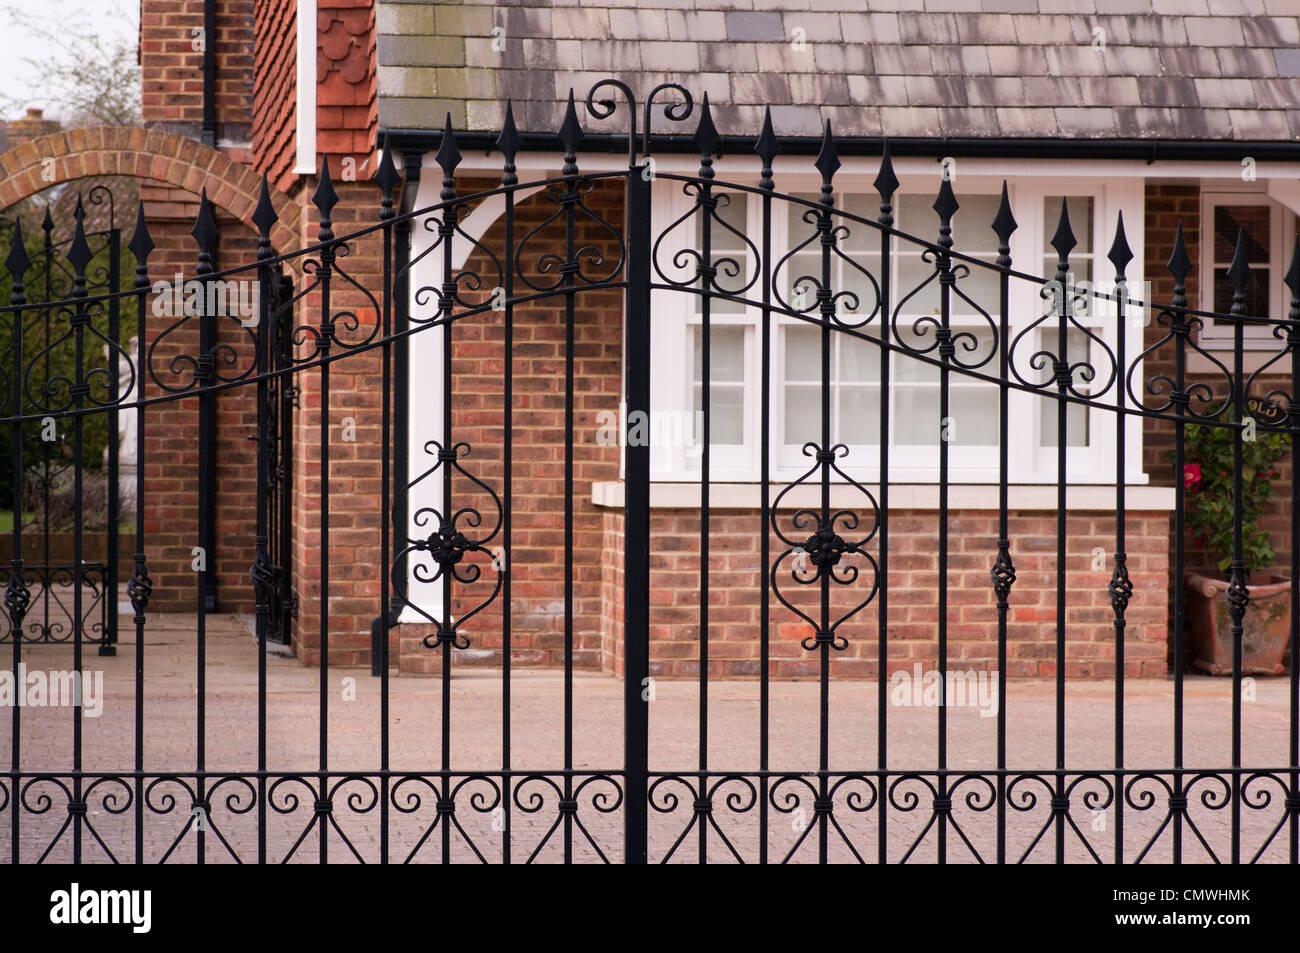 Wrought Iron Metal Driveway Gates Stock Photo: 47276563 - Alamy